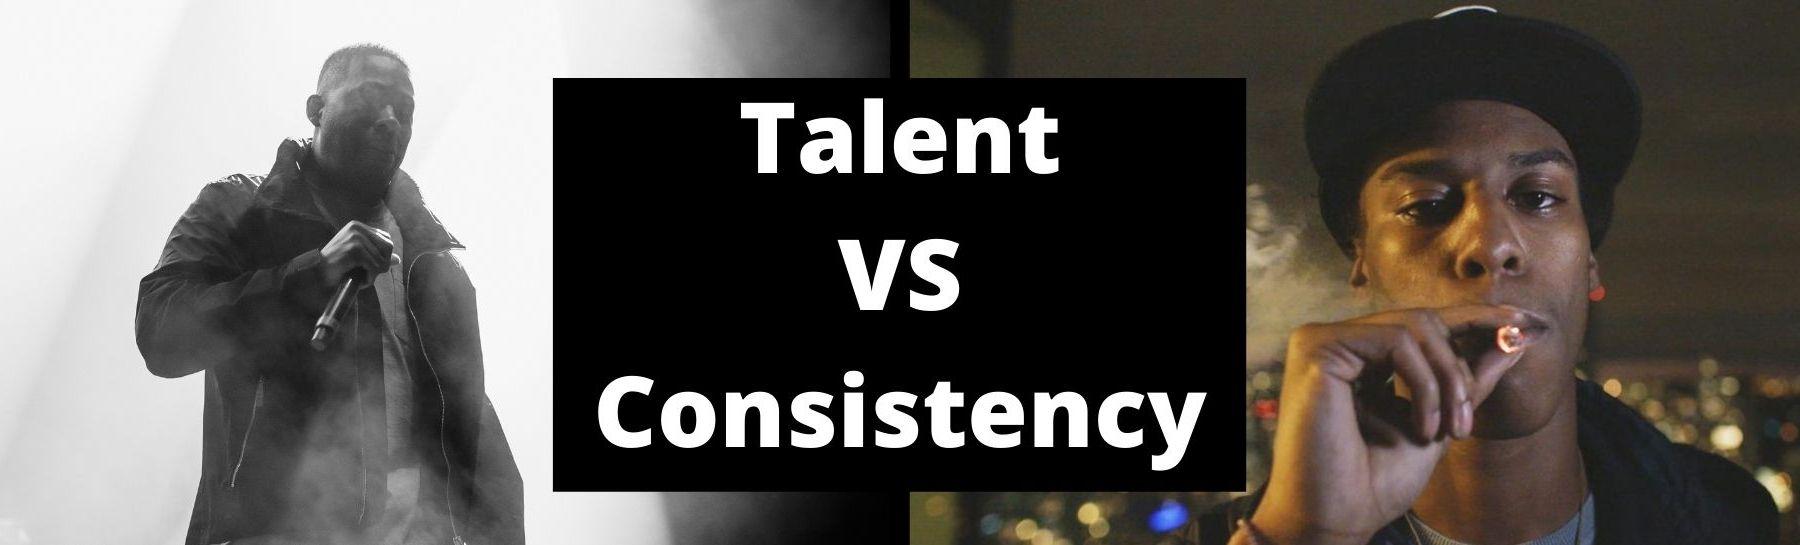 talent vs consistency